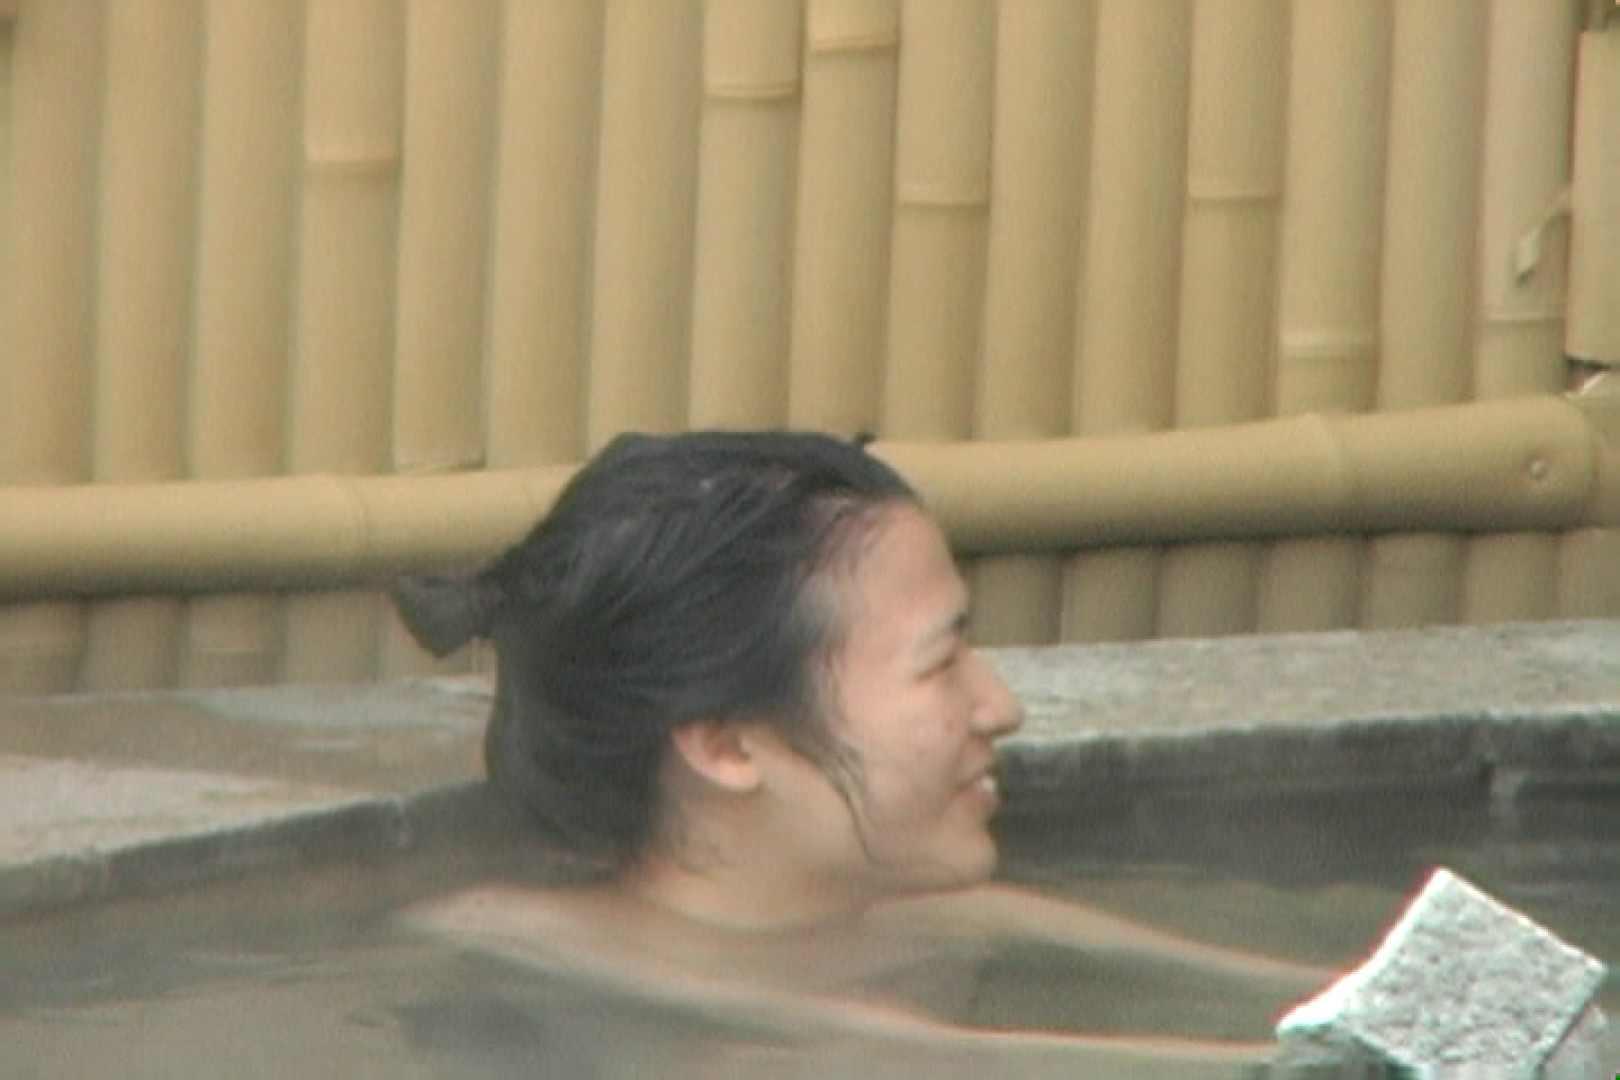 Aquaな露天風呂Vol.647 OLセックス 盗撮戯れ無修正画像 83画像 56